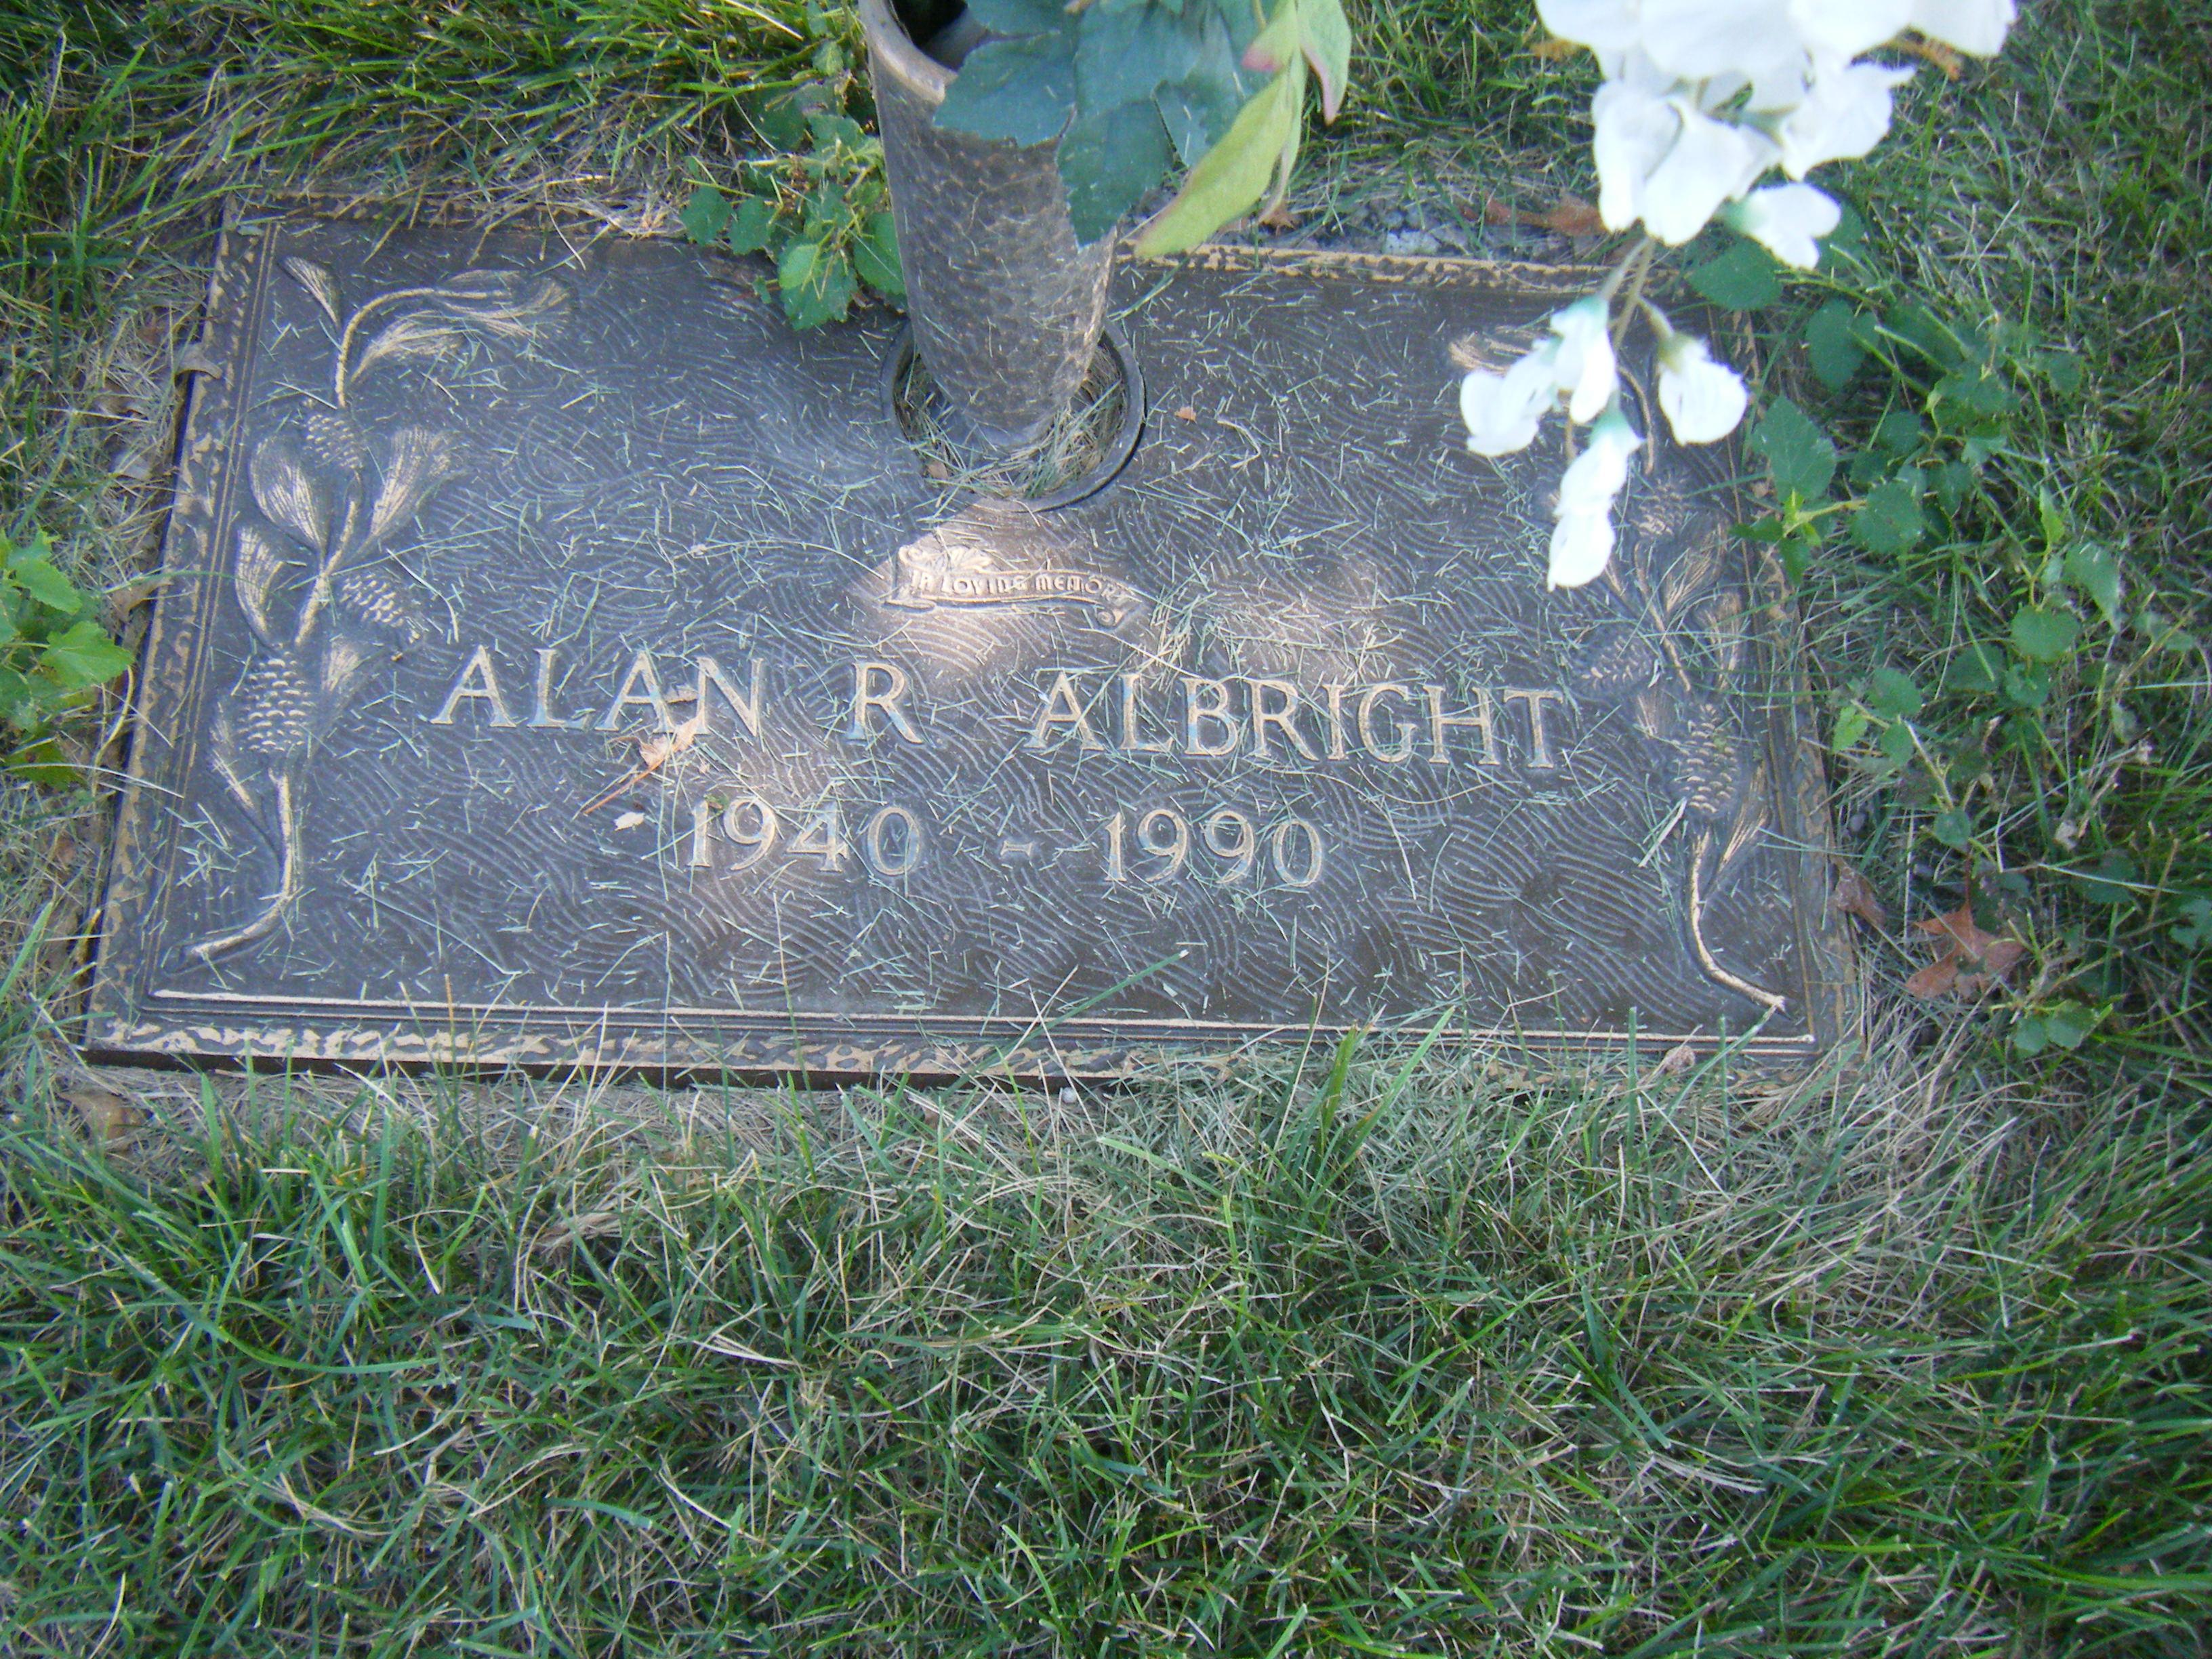 Alan R Albright